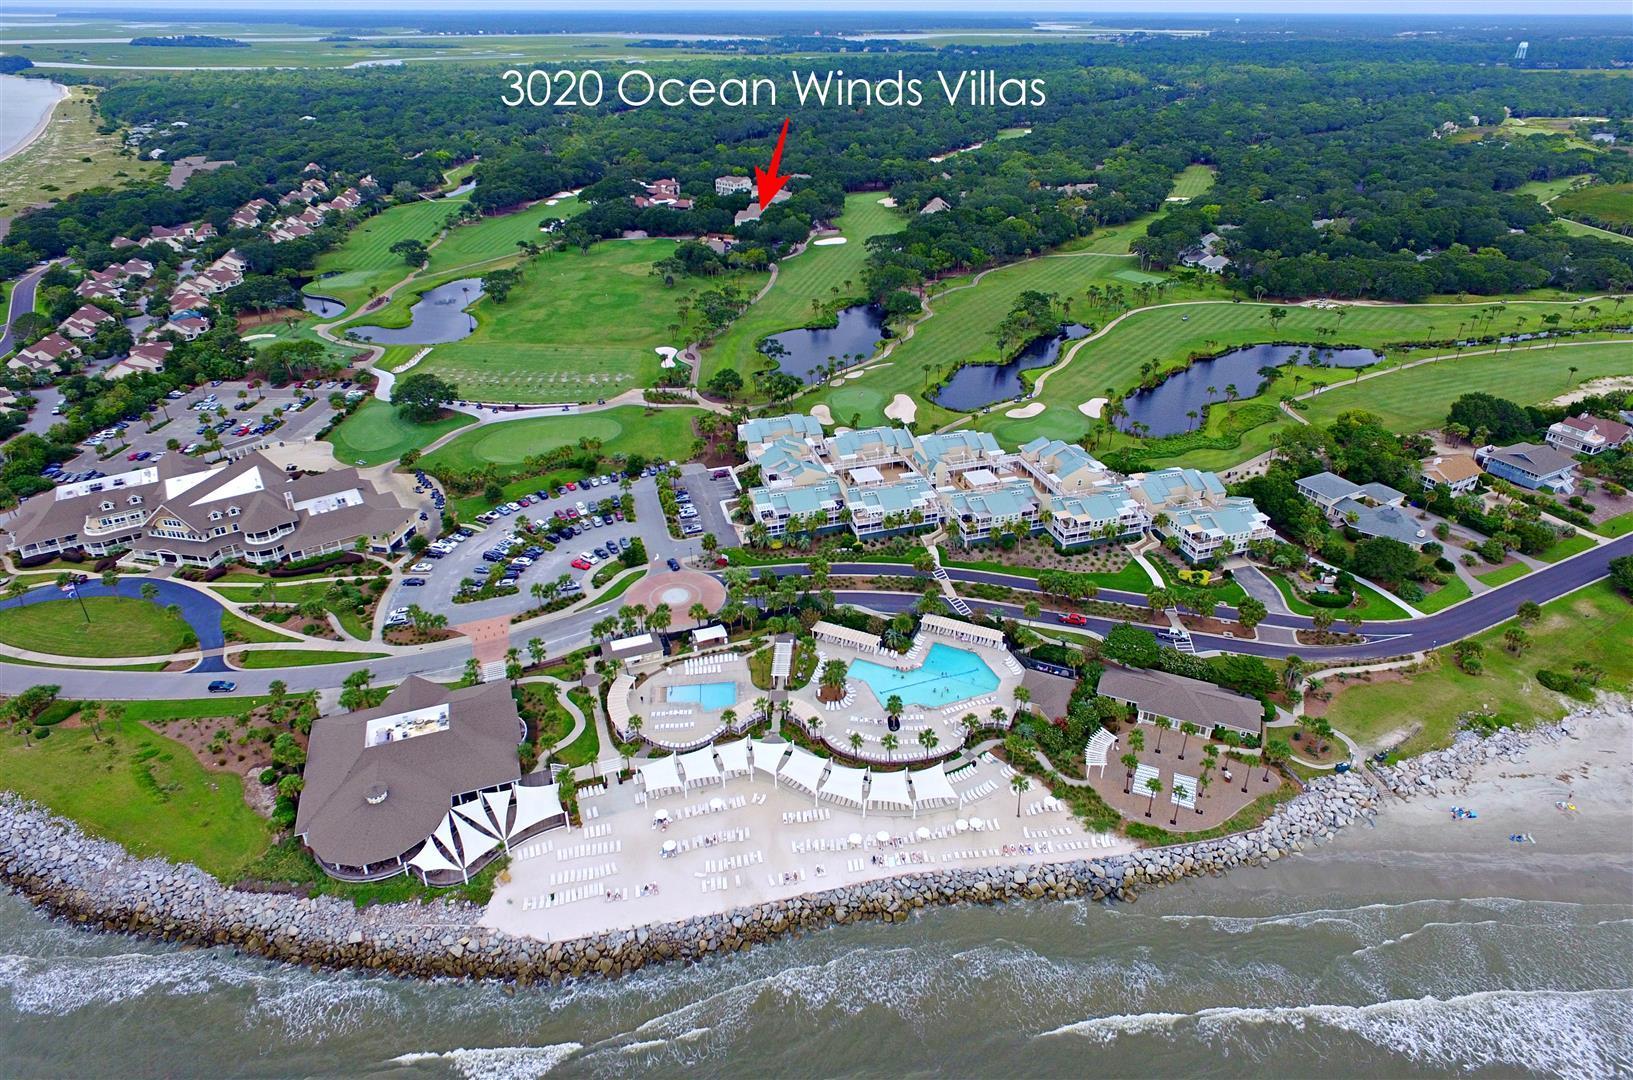 Seabrook Island Homes For Sale - 3020 Ocean Winds, Seabrook Island, SC - 17